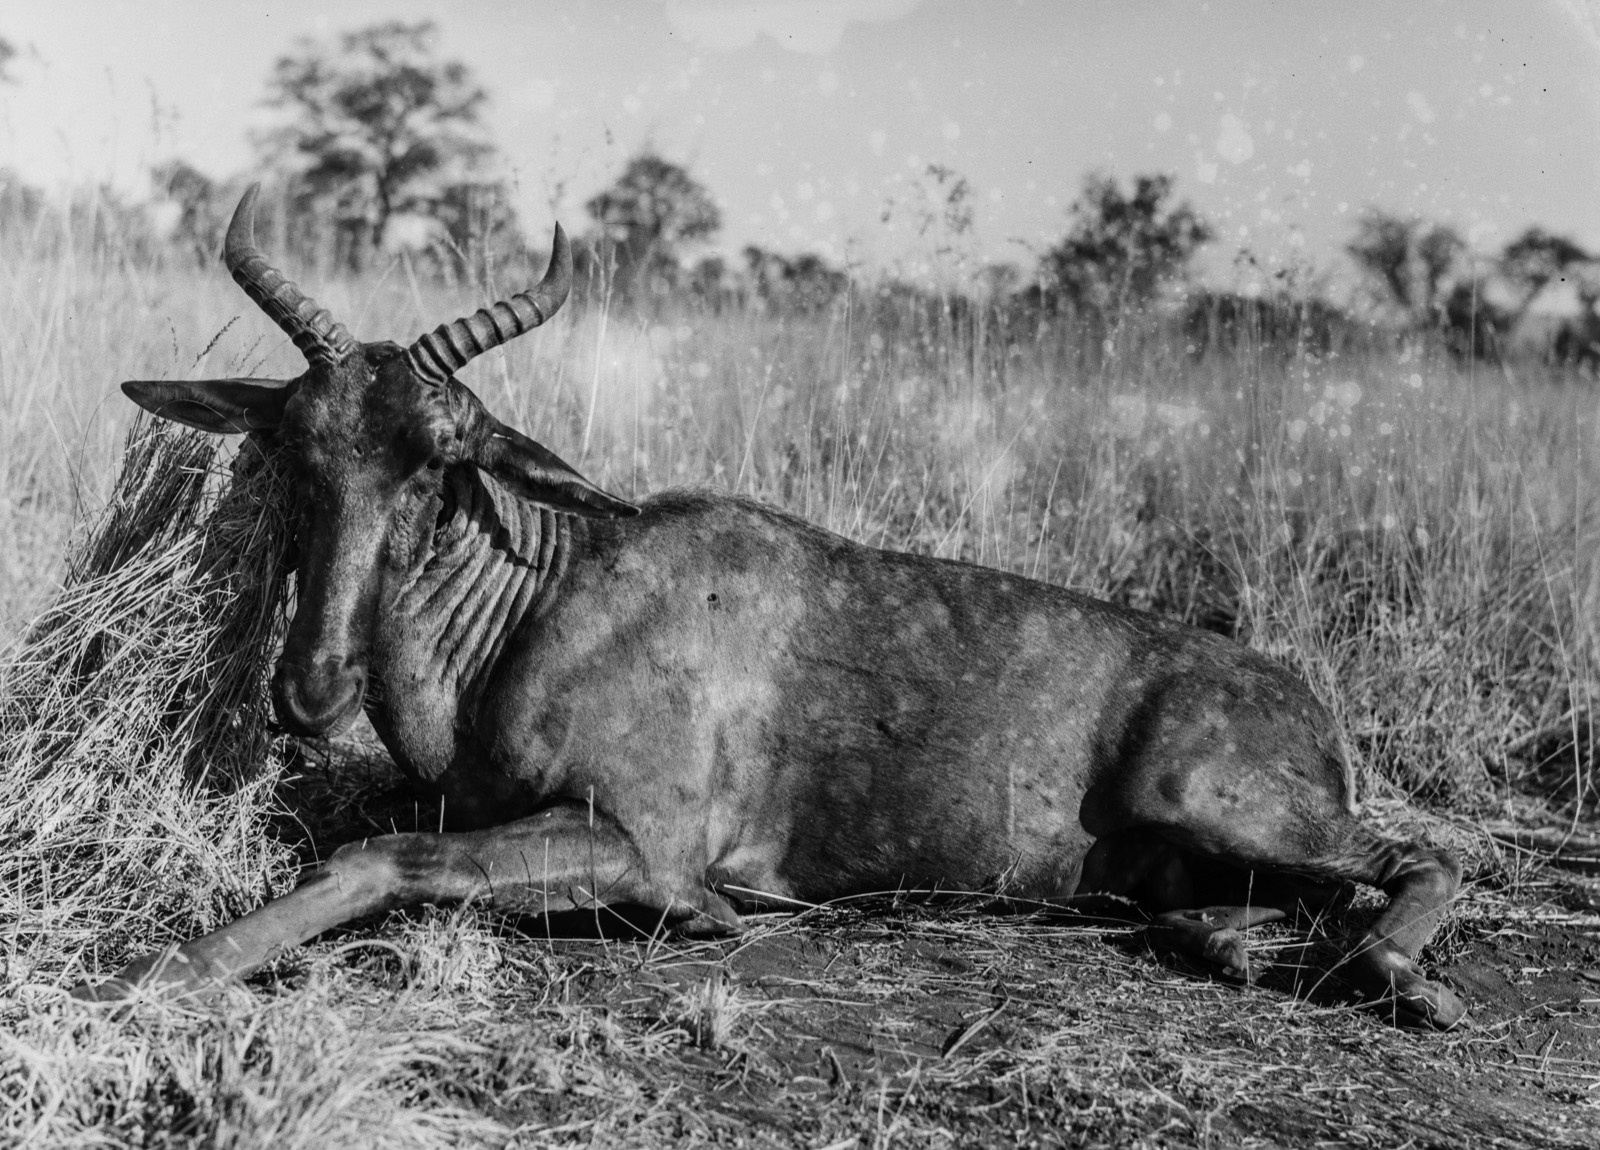 Бечуаналенд. Убитая антилопа цессеби